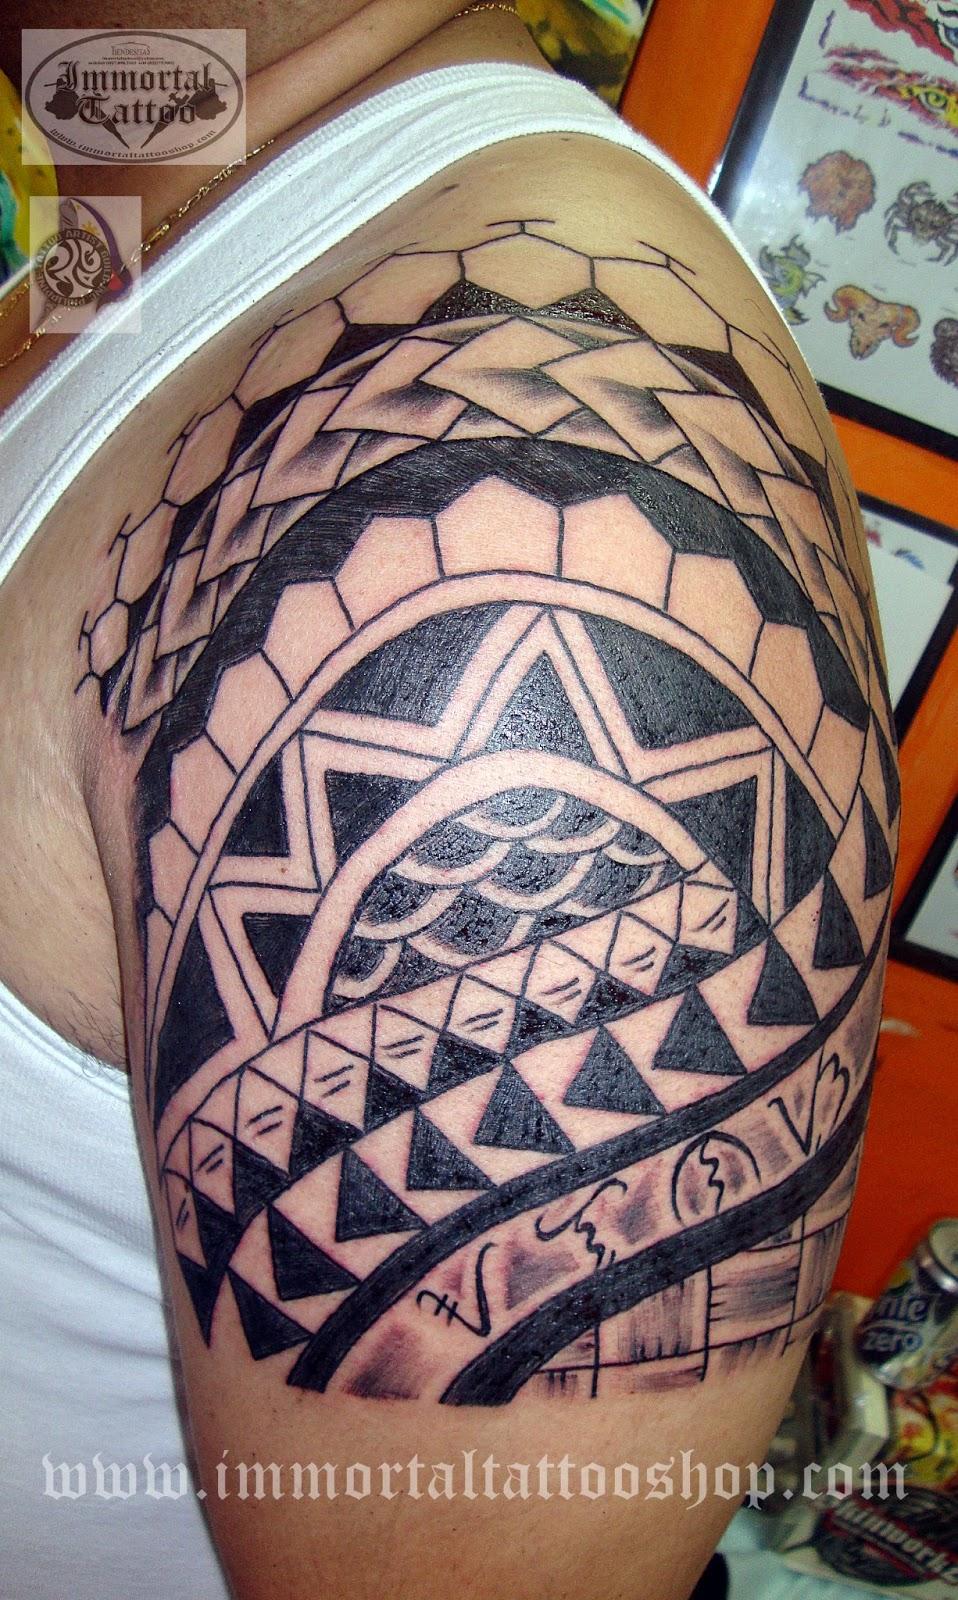 ... tattoo and his last name Alonzo, translated in baybayin(alibata) an